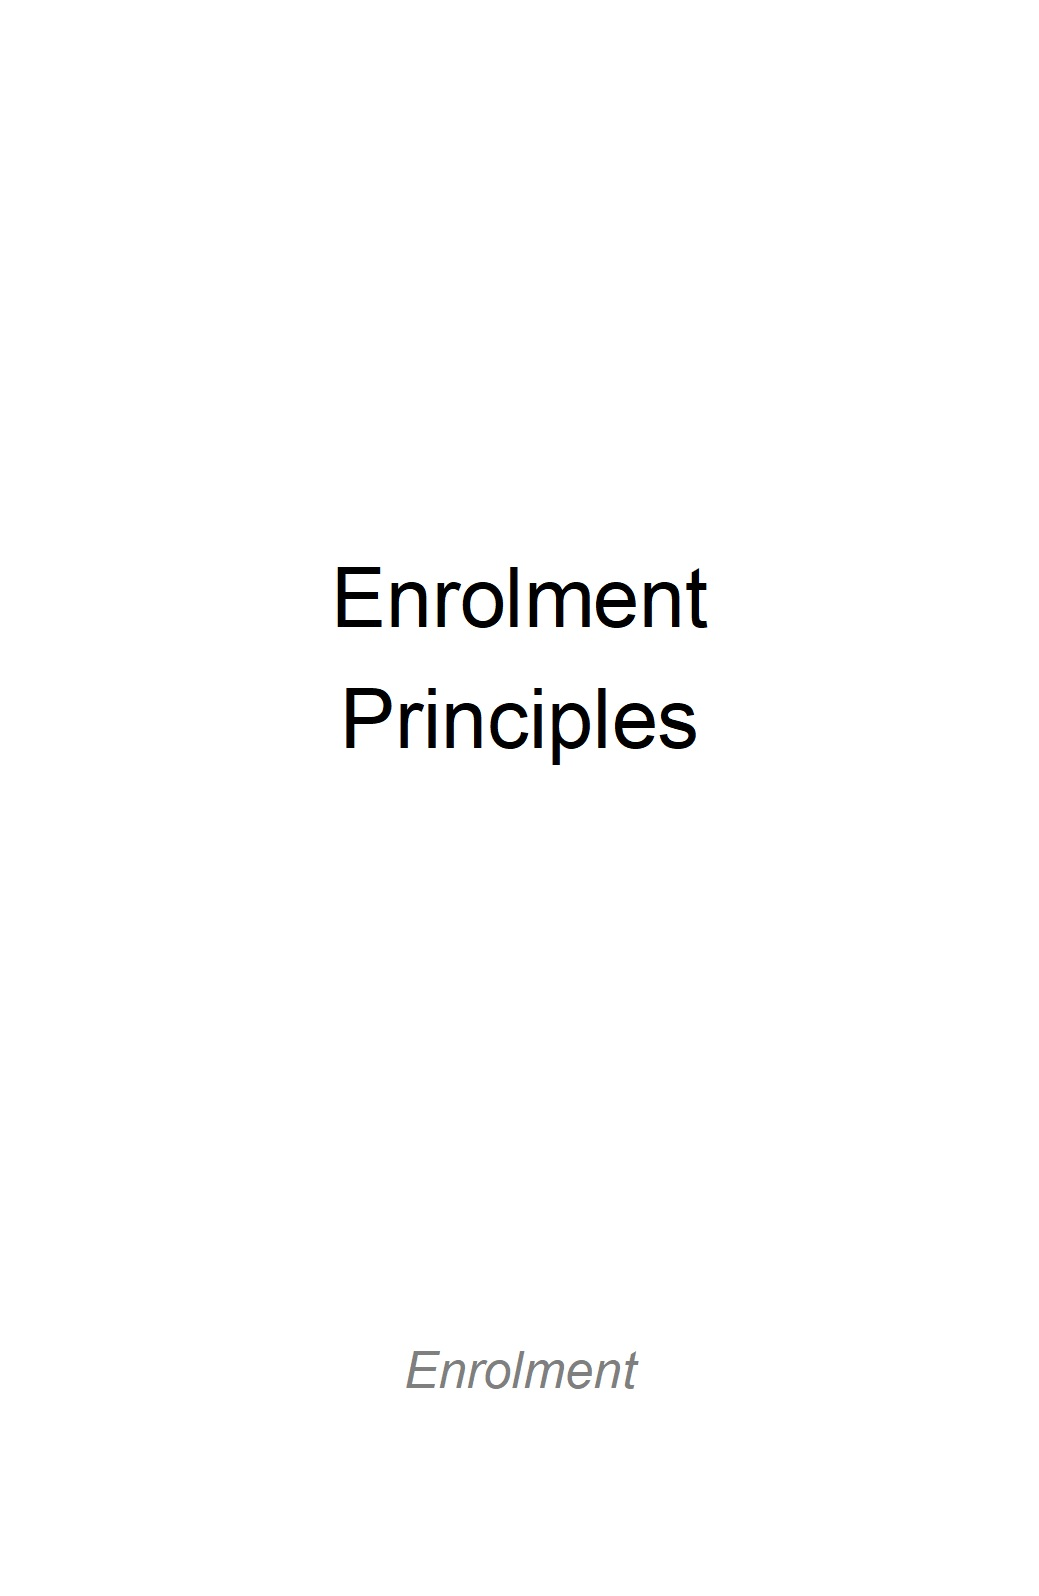 Enrolment Principles for Diocesan Systemic Schools